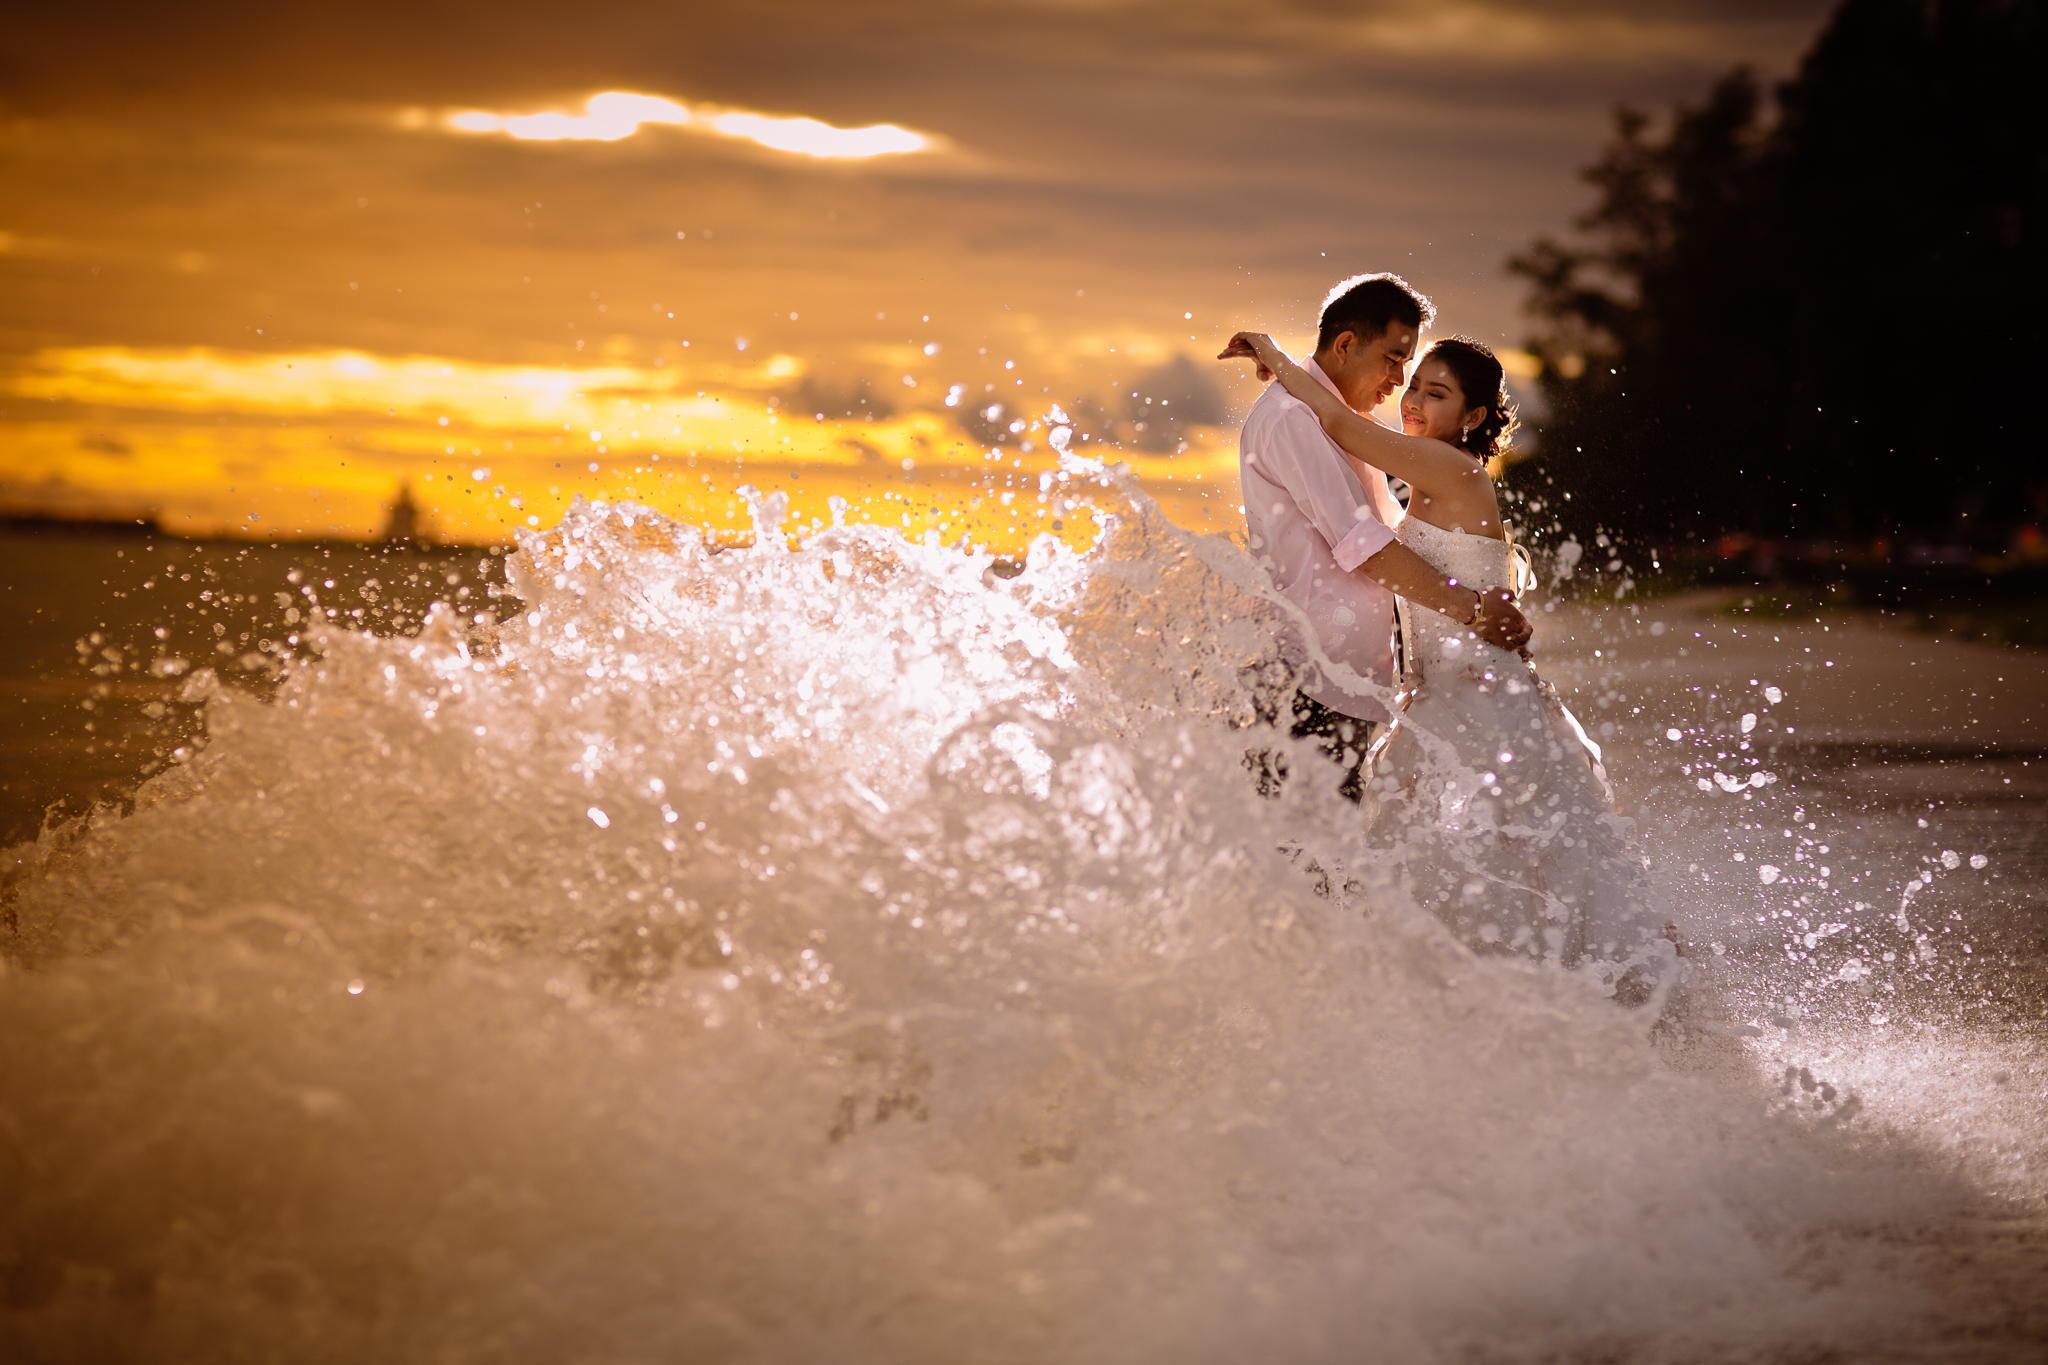 wave creative idea rain 500px photograph ivan